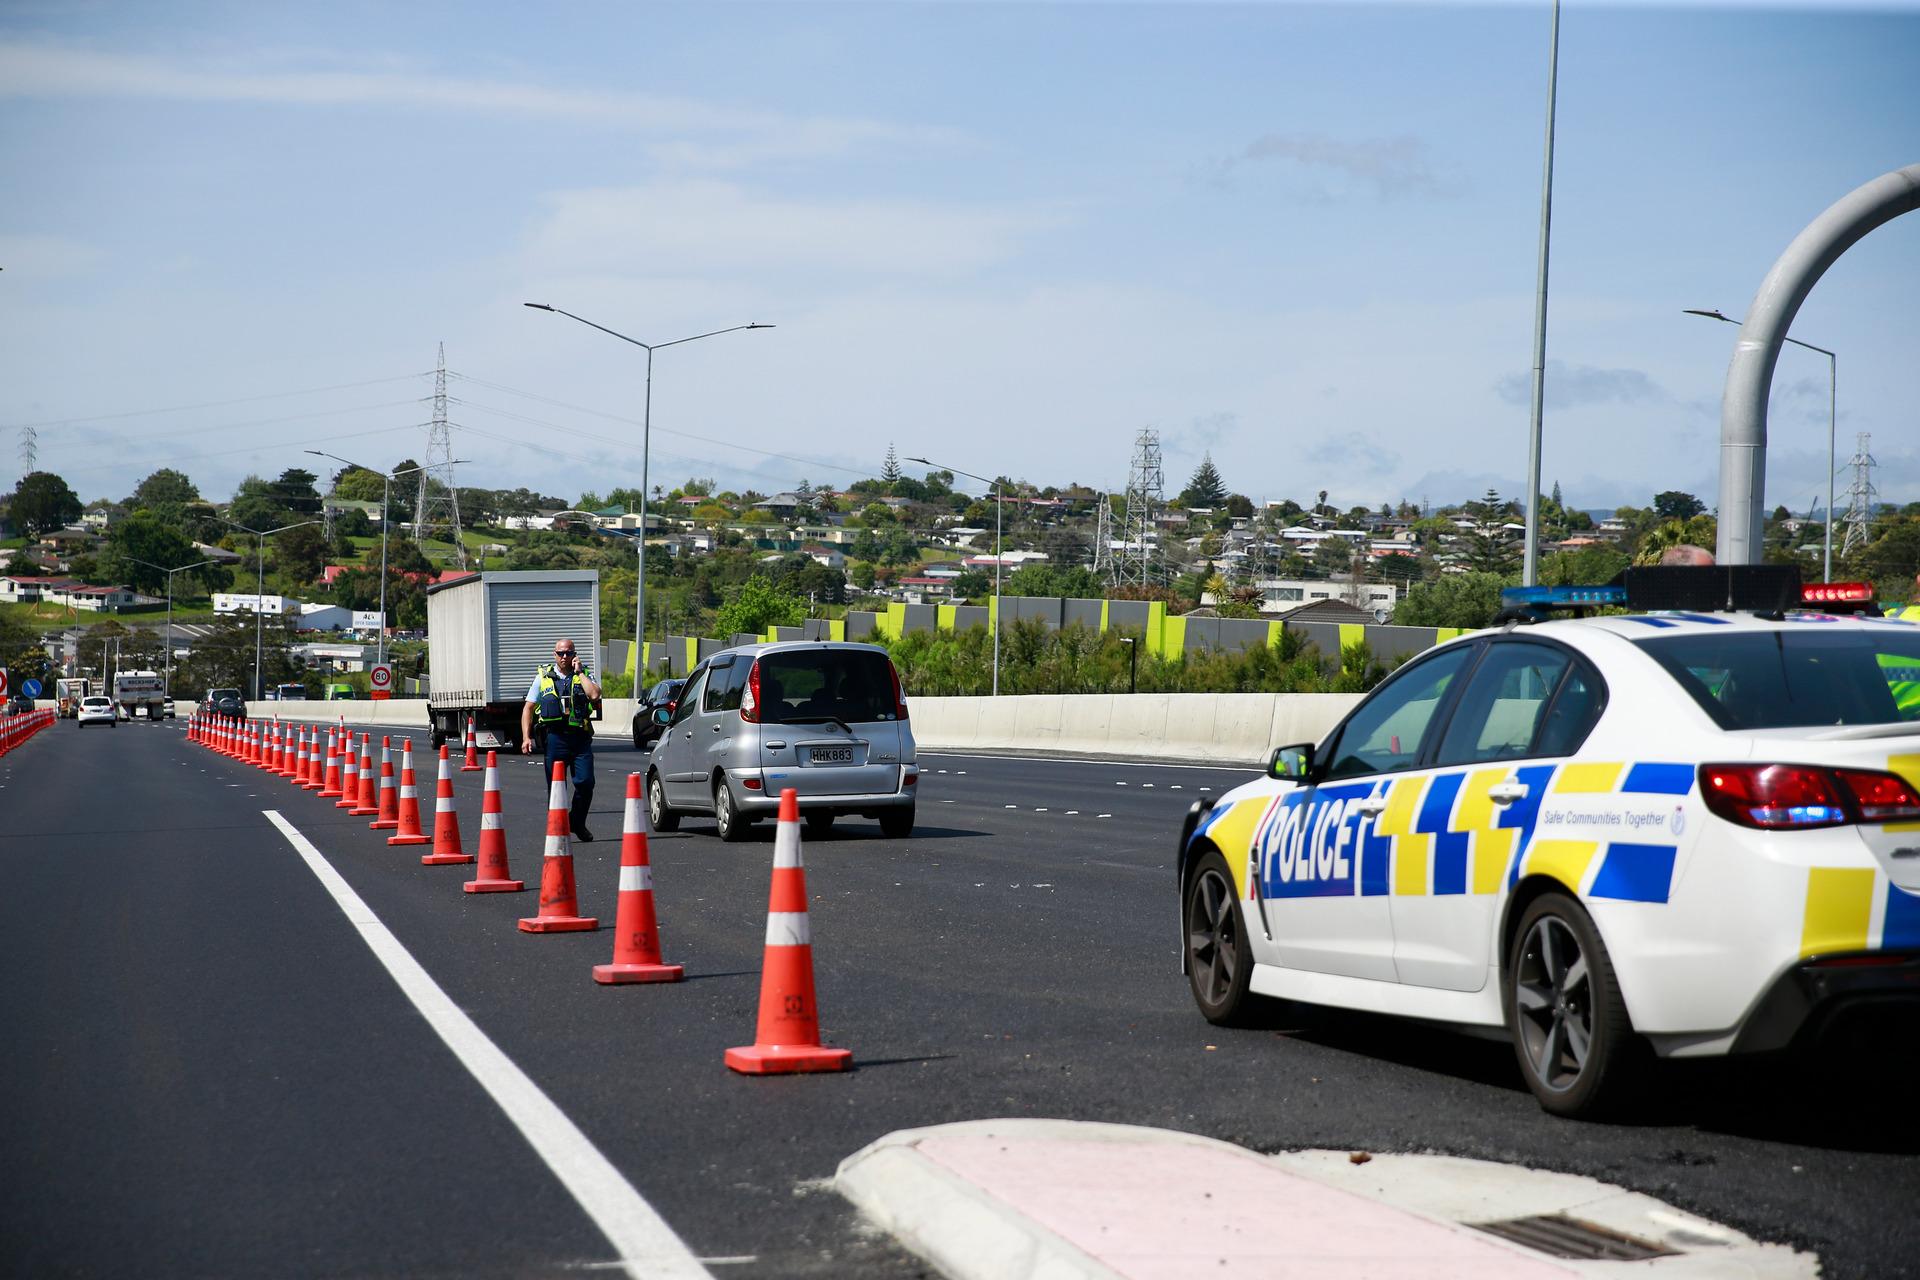 Motorist 'shot' while driving: Police